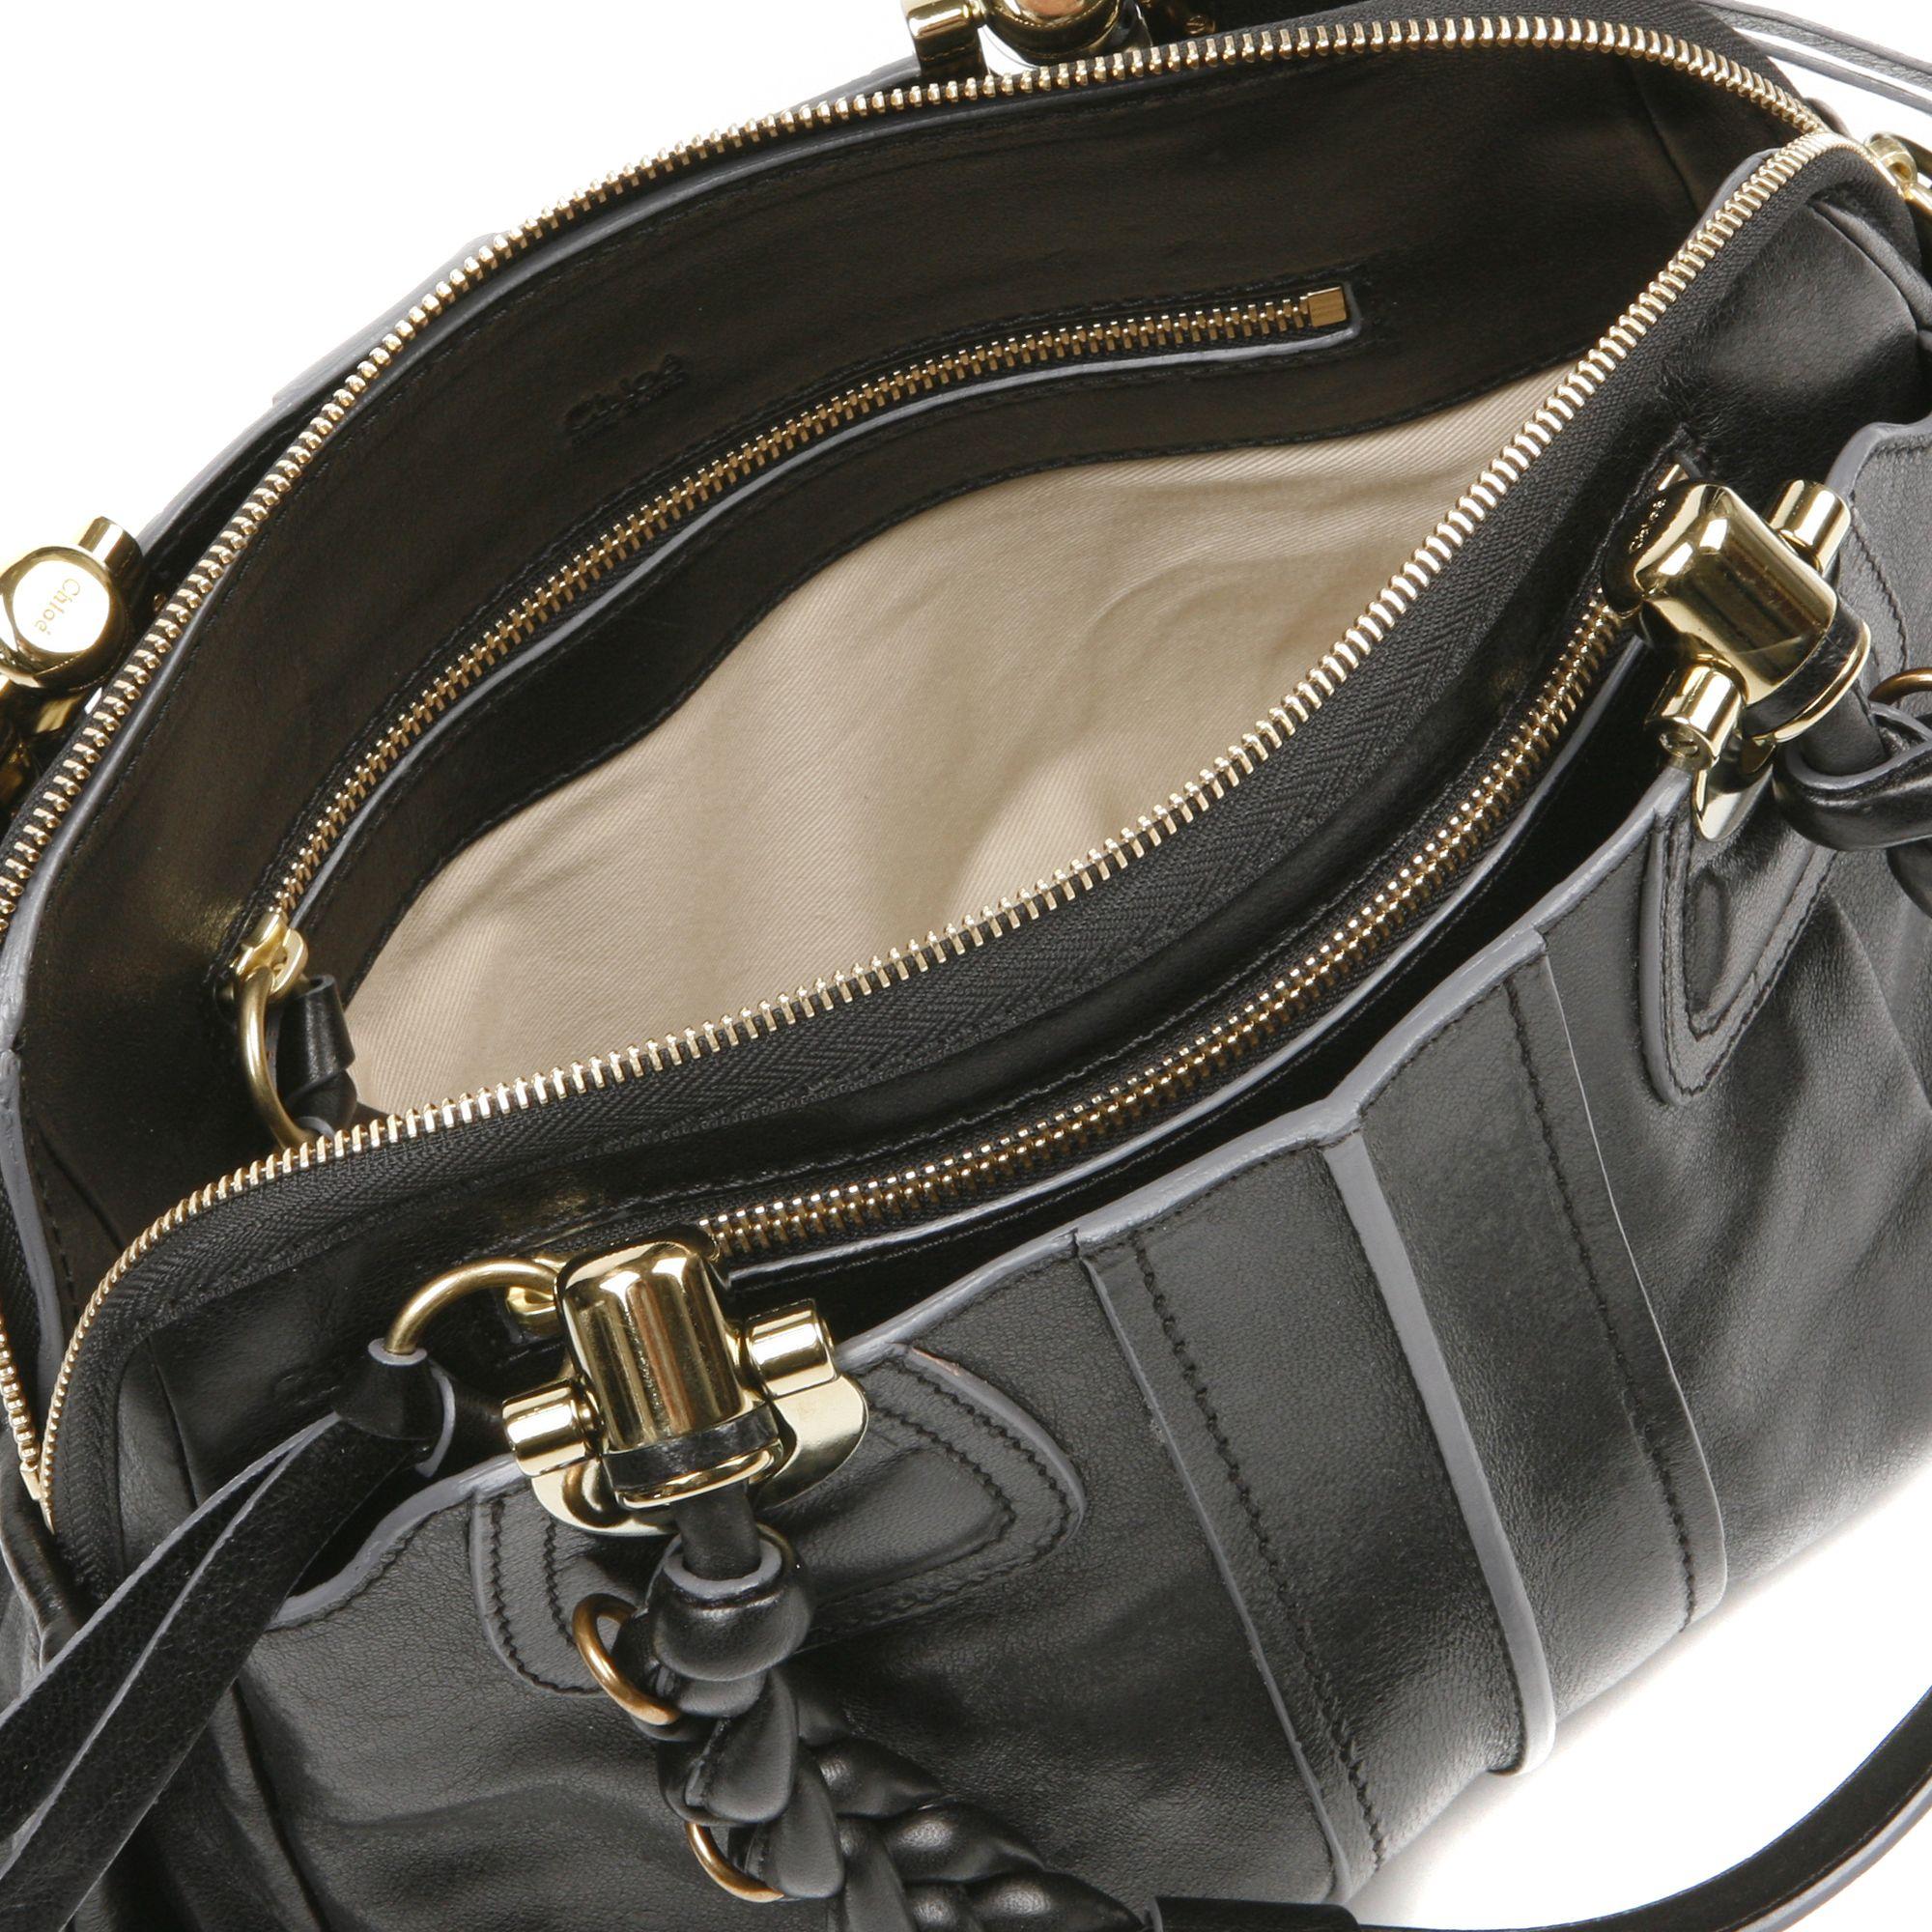 Chlo¨¦ Heloise Lamb Leather Bag in Black | Lyst